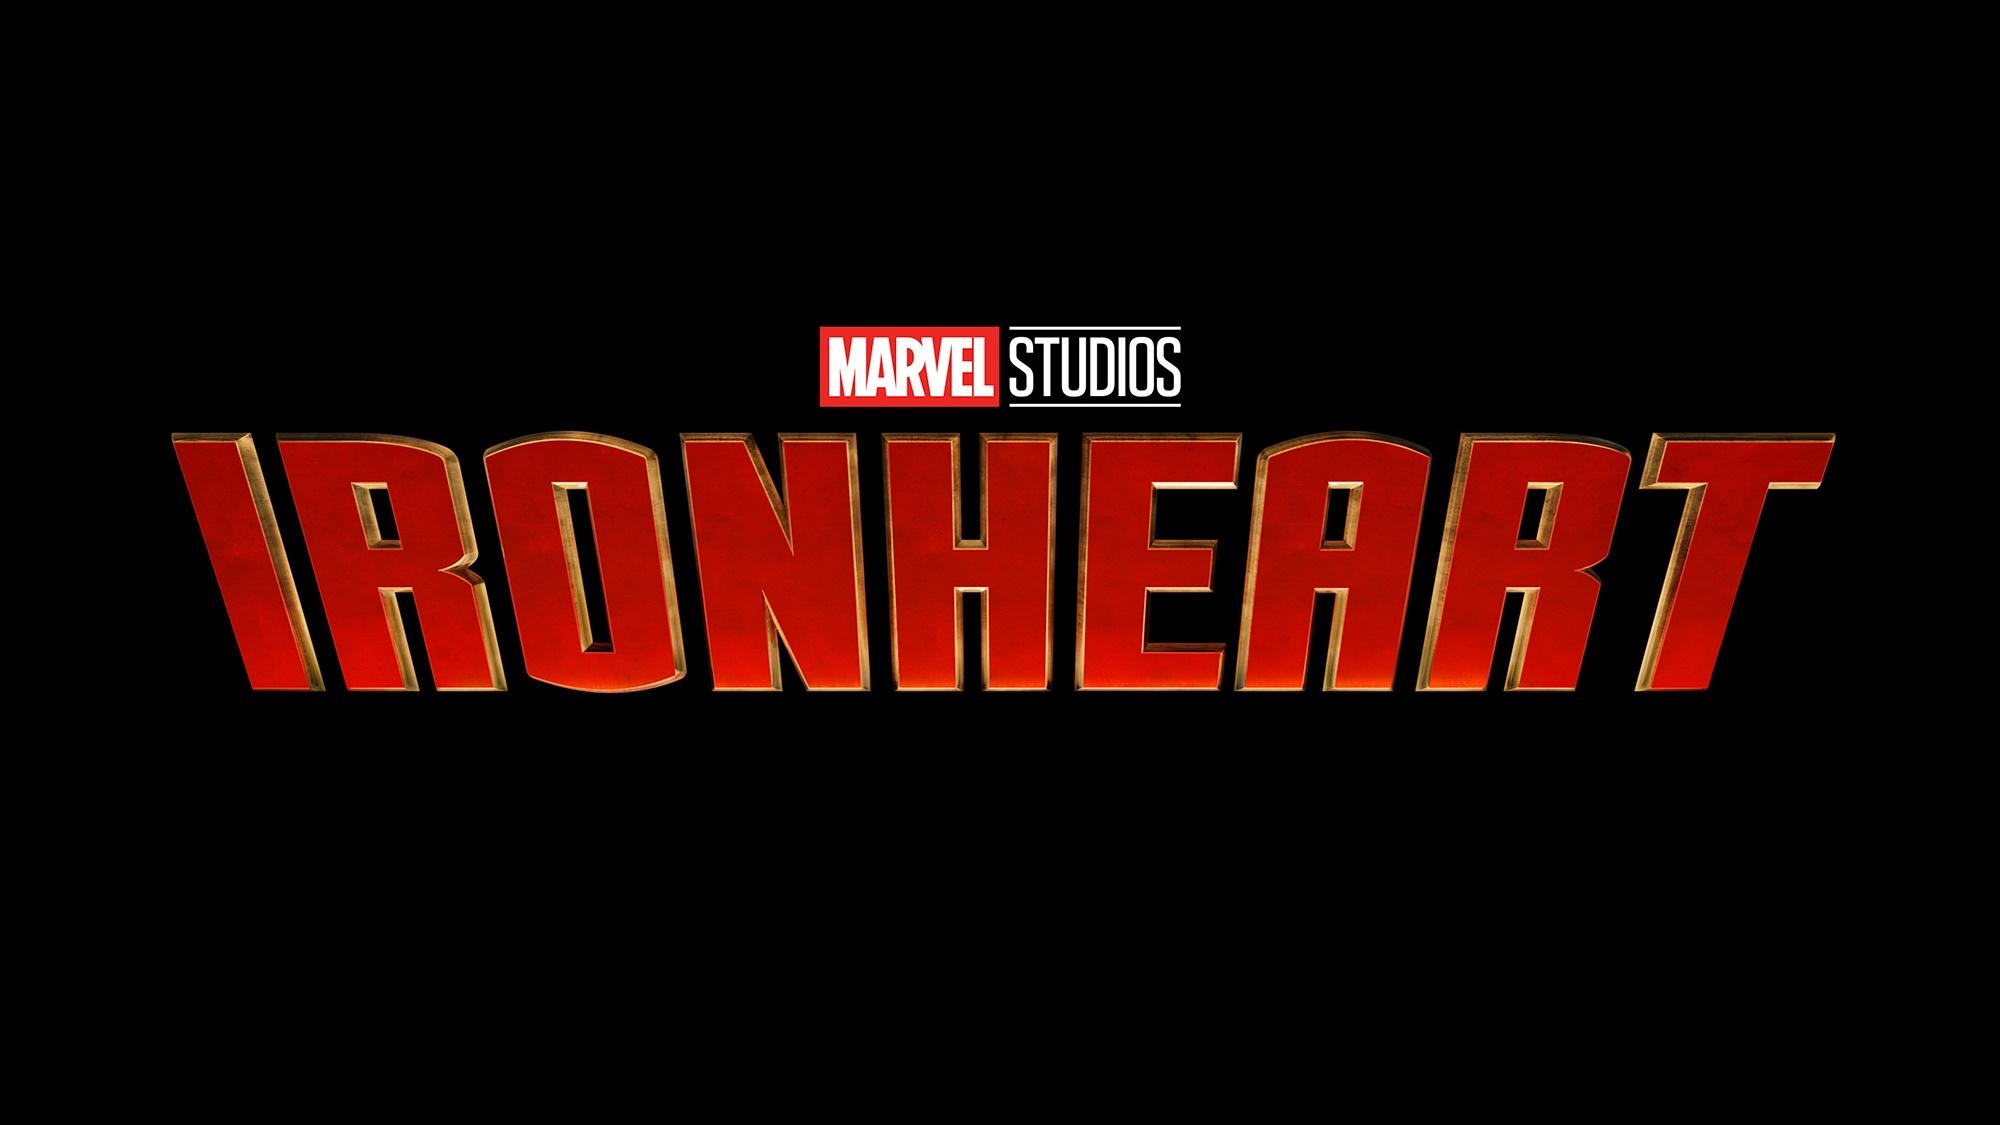 ironheart_logo.jpg